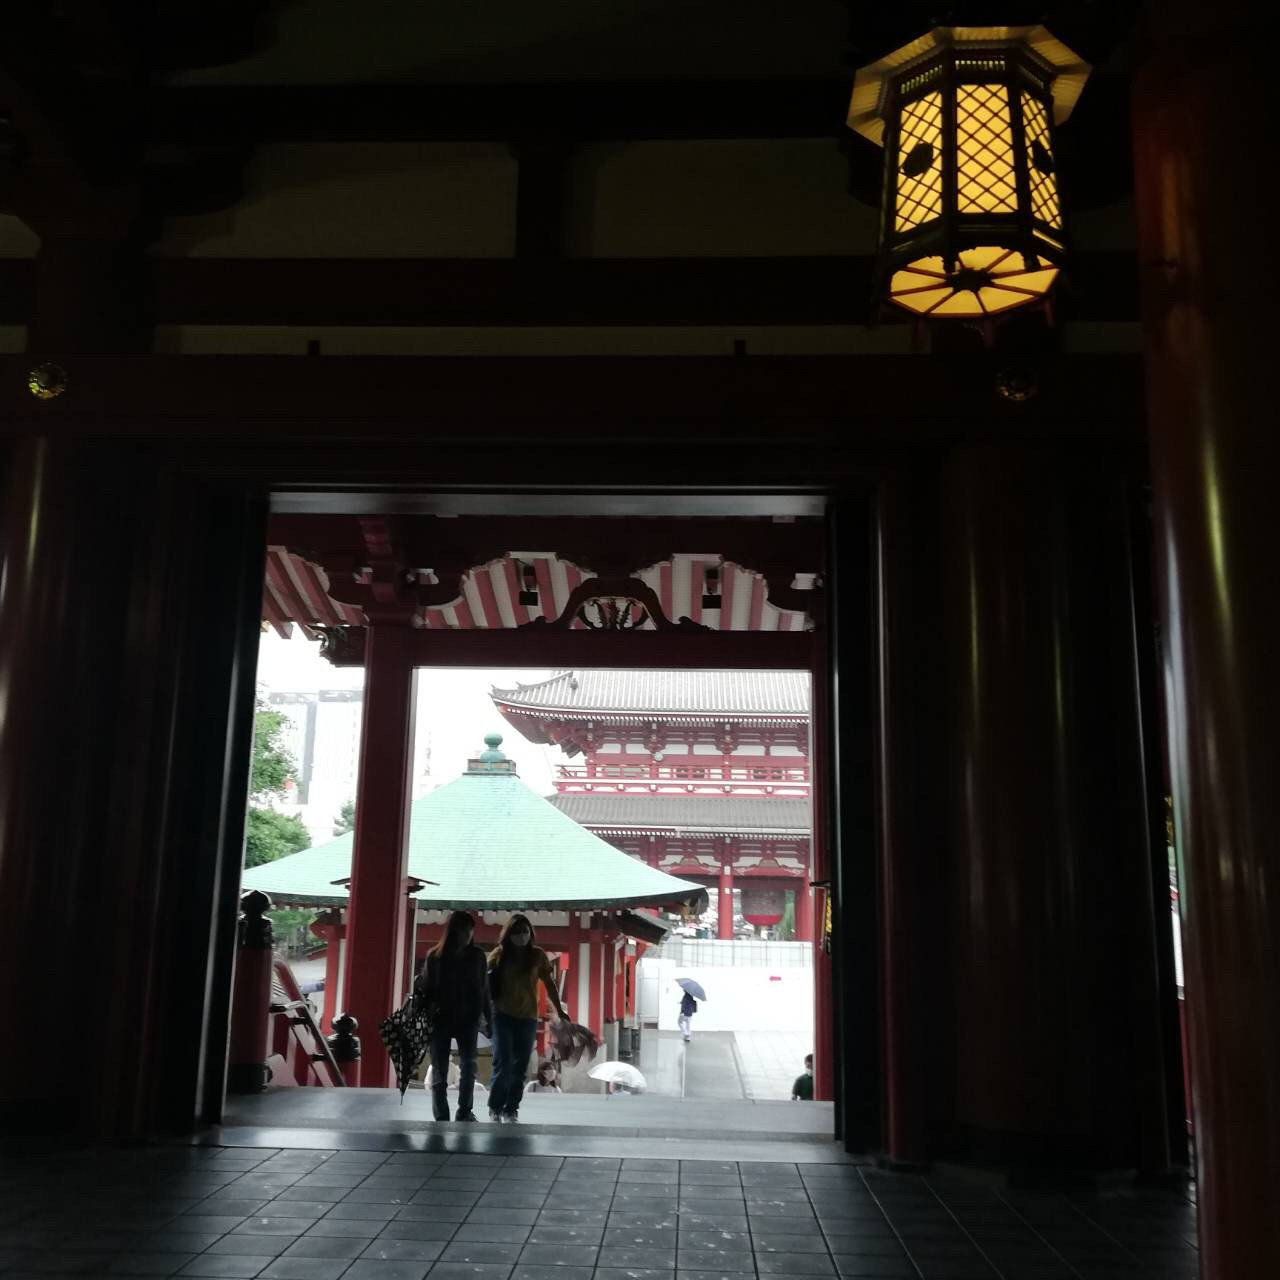 月宮殿 -Tukikyuden-